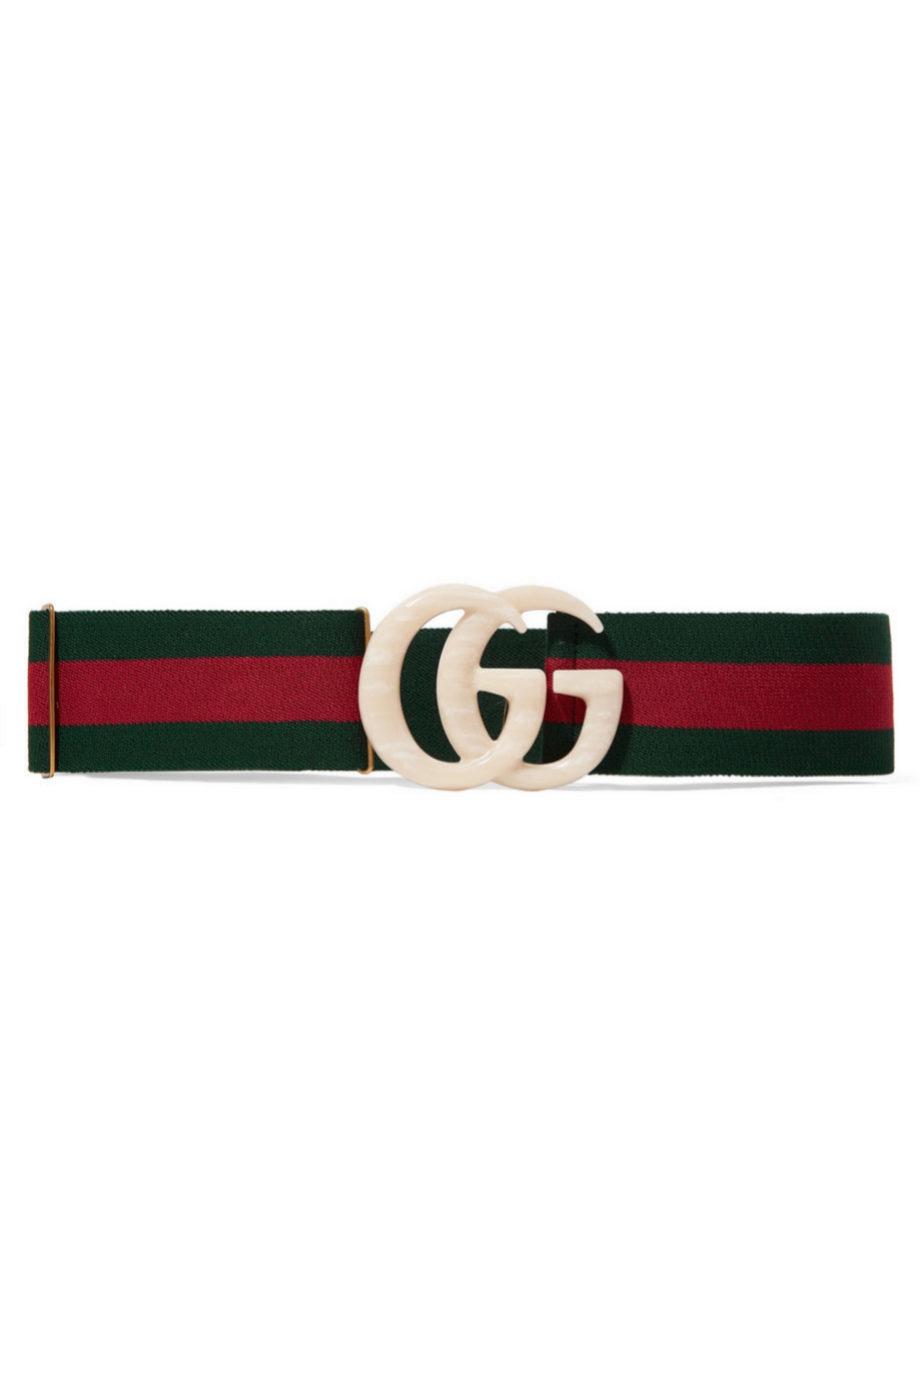 Cinturón de tela con hebilla de Gucci para Net a Porter